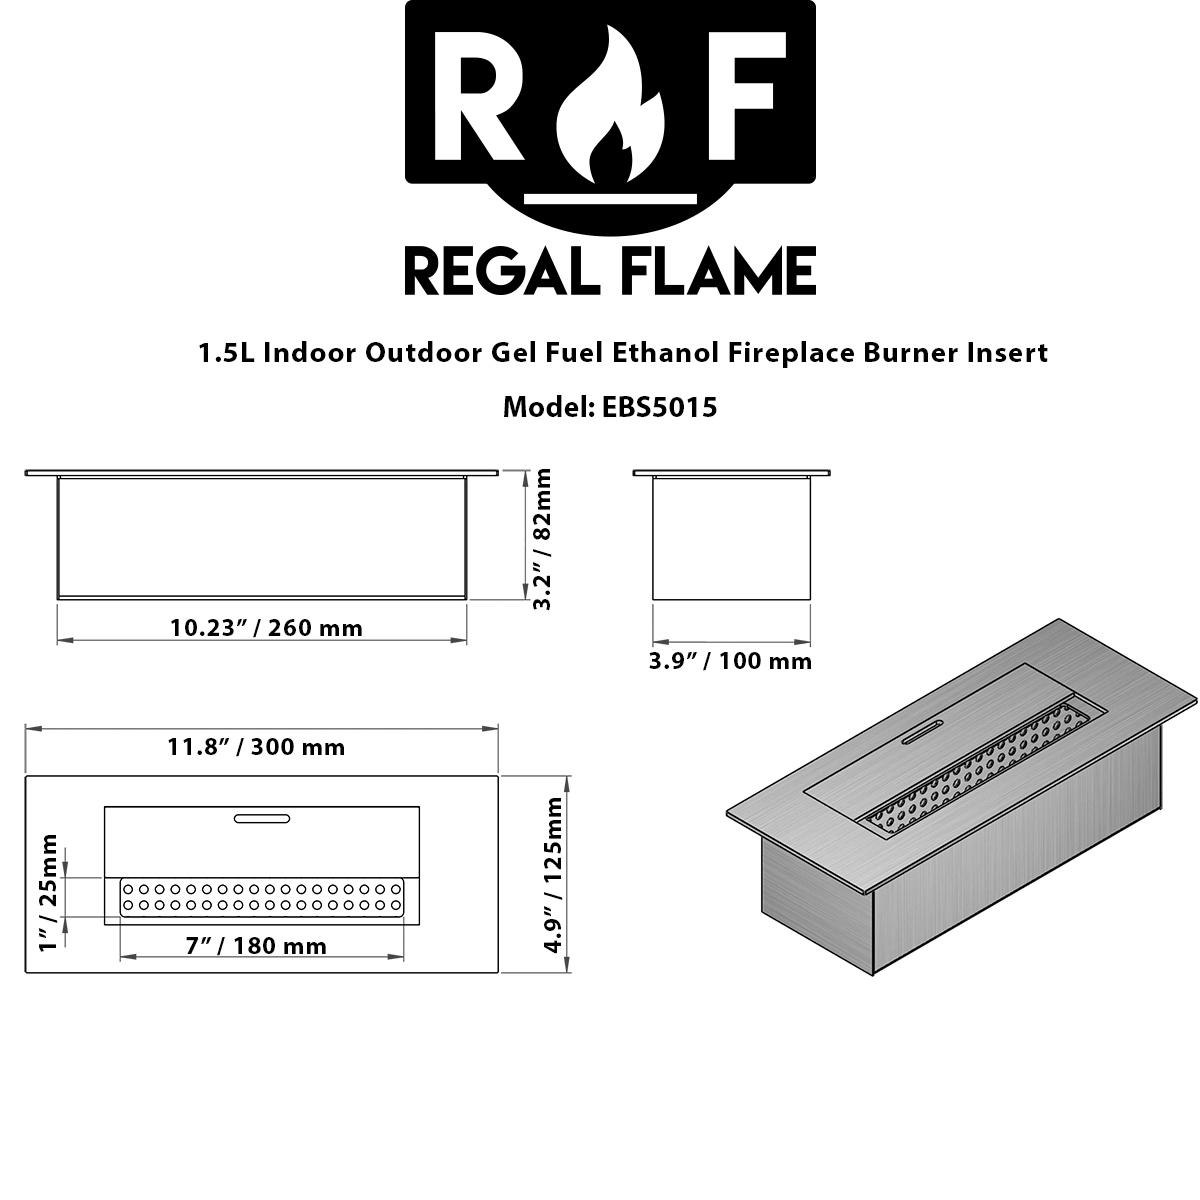 slim 12 inch bio ethanol fireplace burner insert 1 5 liter